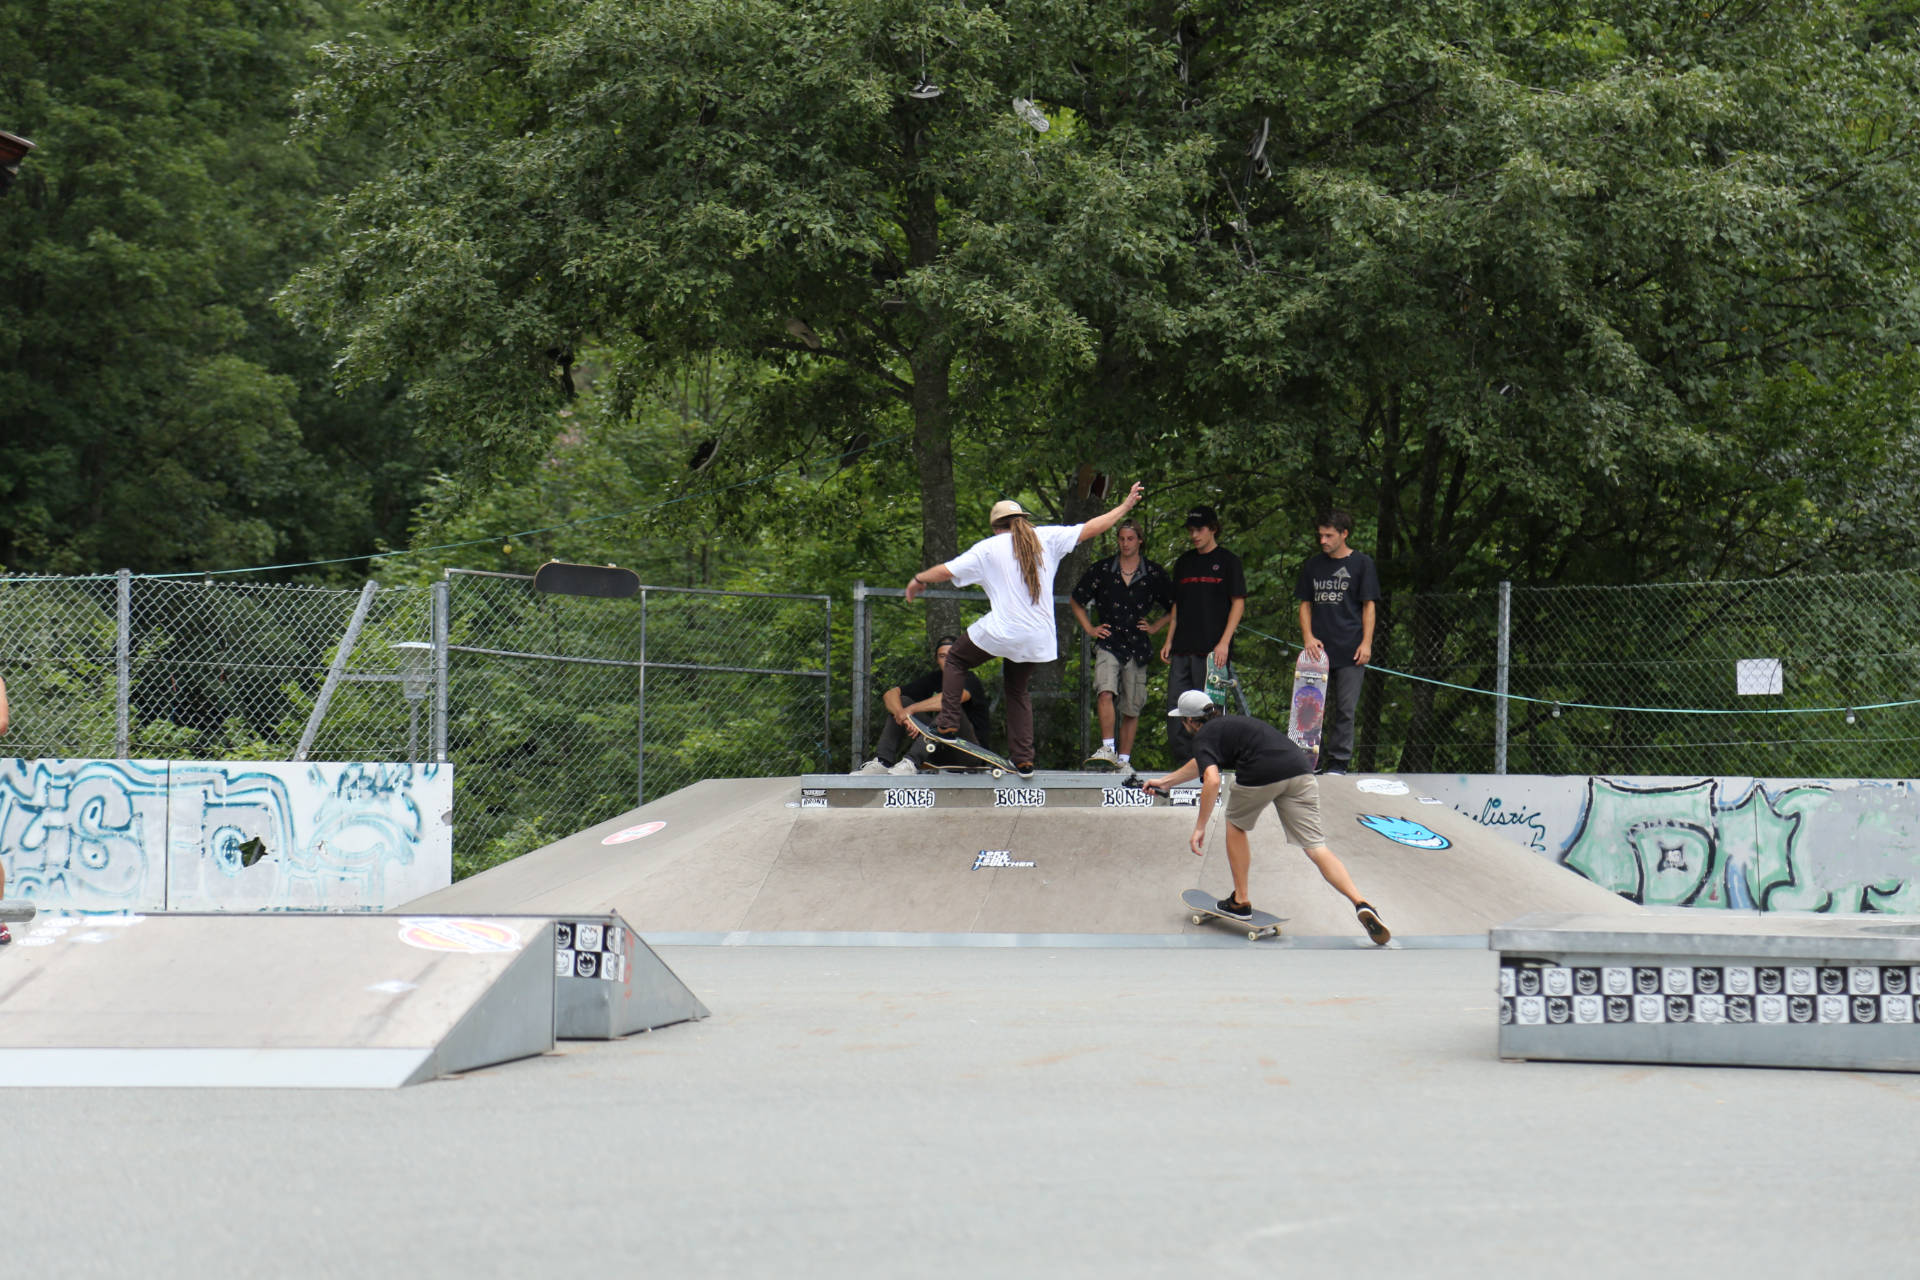 skateboardheadz fieberbrunn kgt 2019 finale 00125